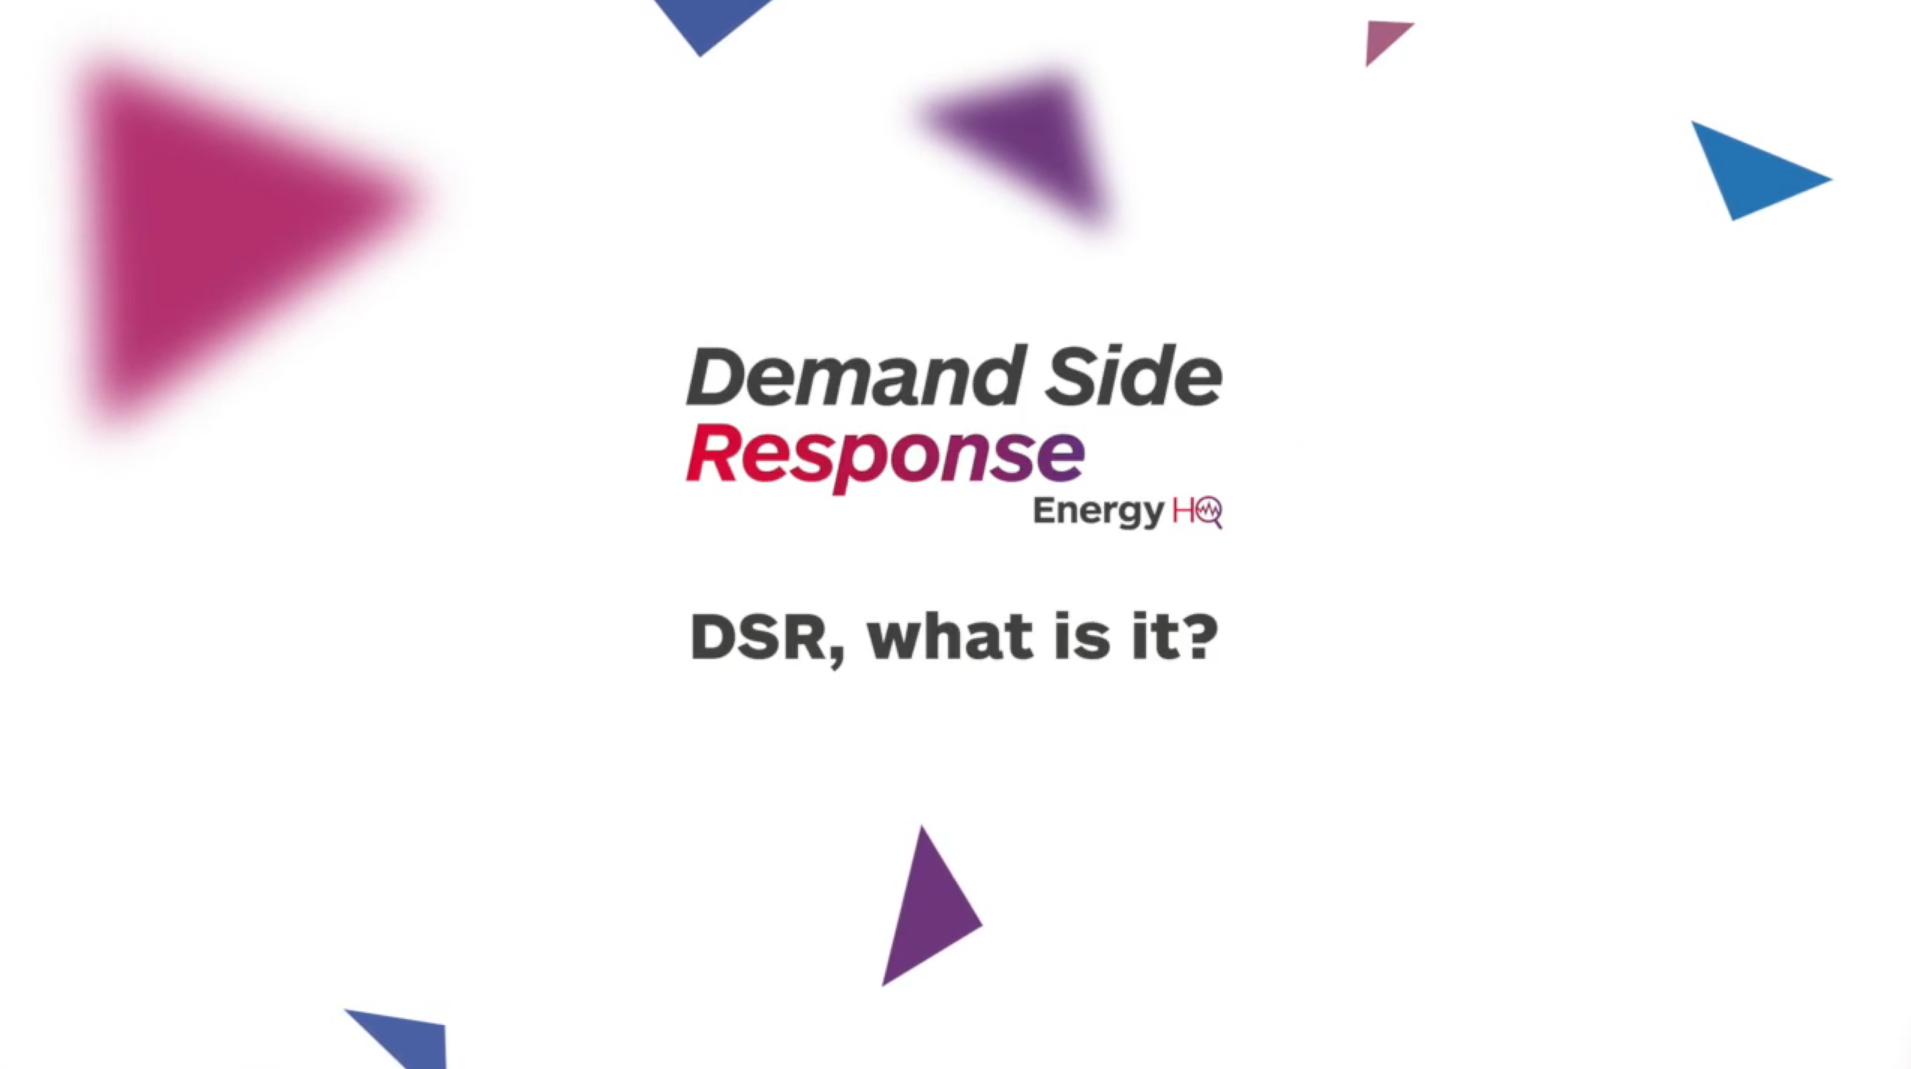 DSR, what is it?